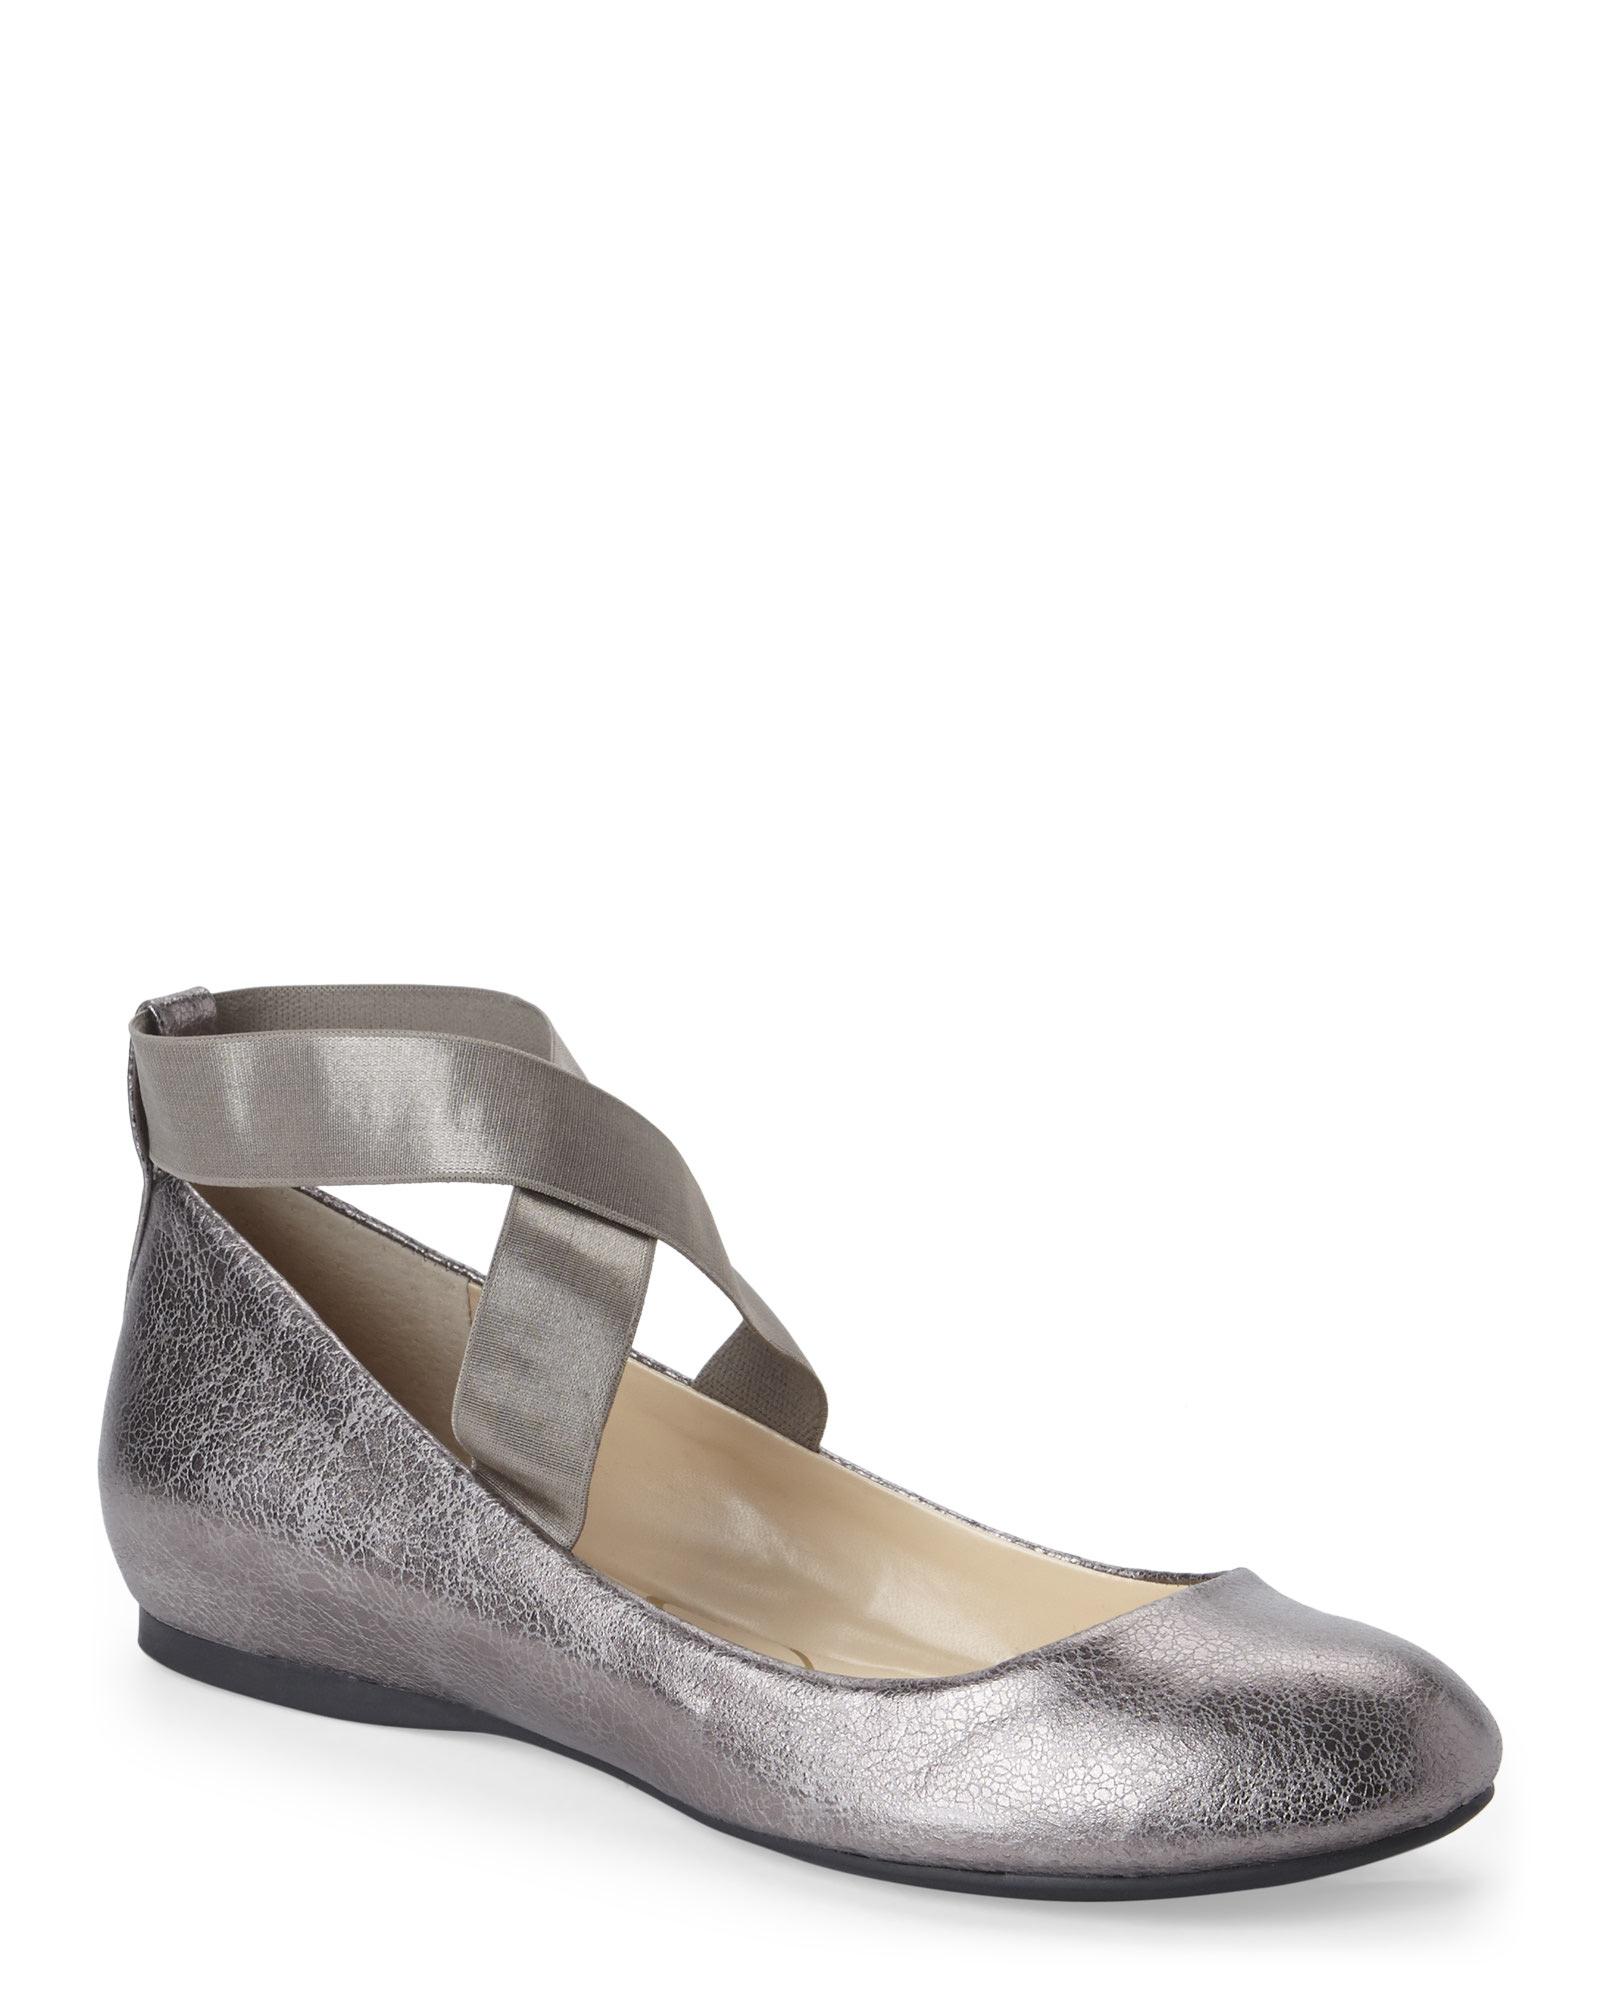 Criss Cross Flats Shoes